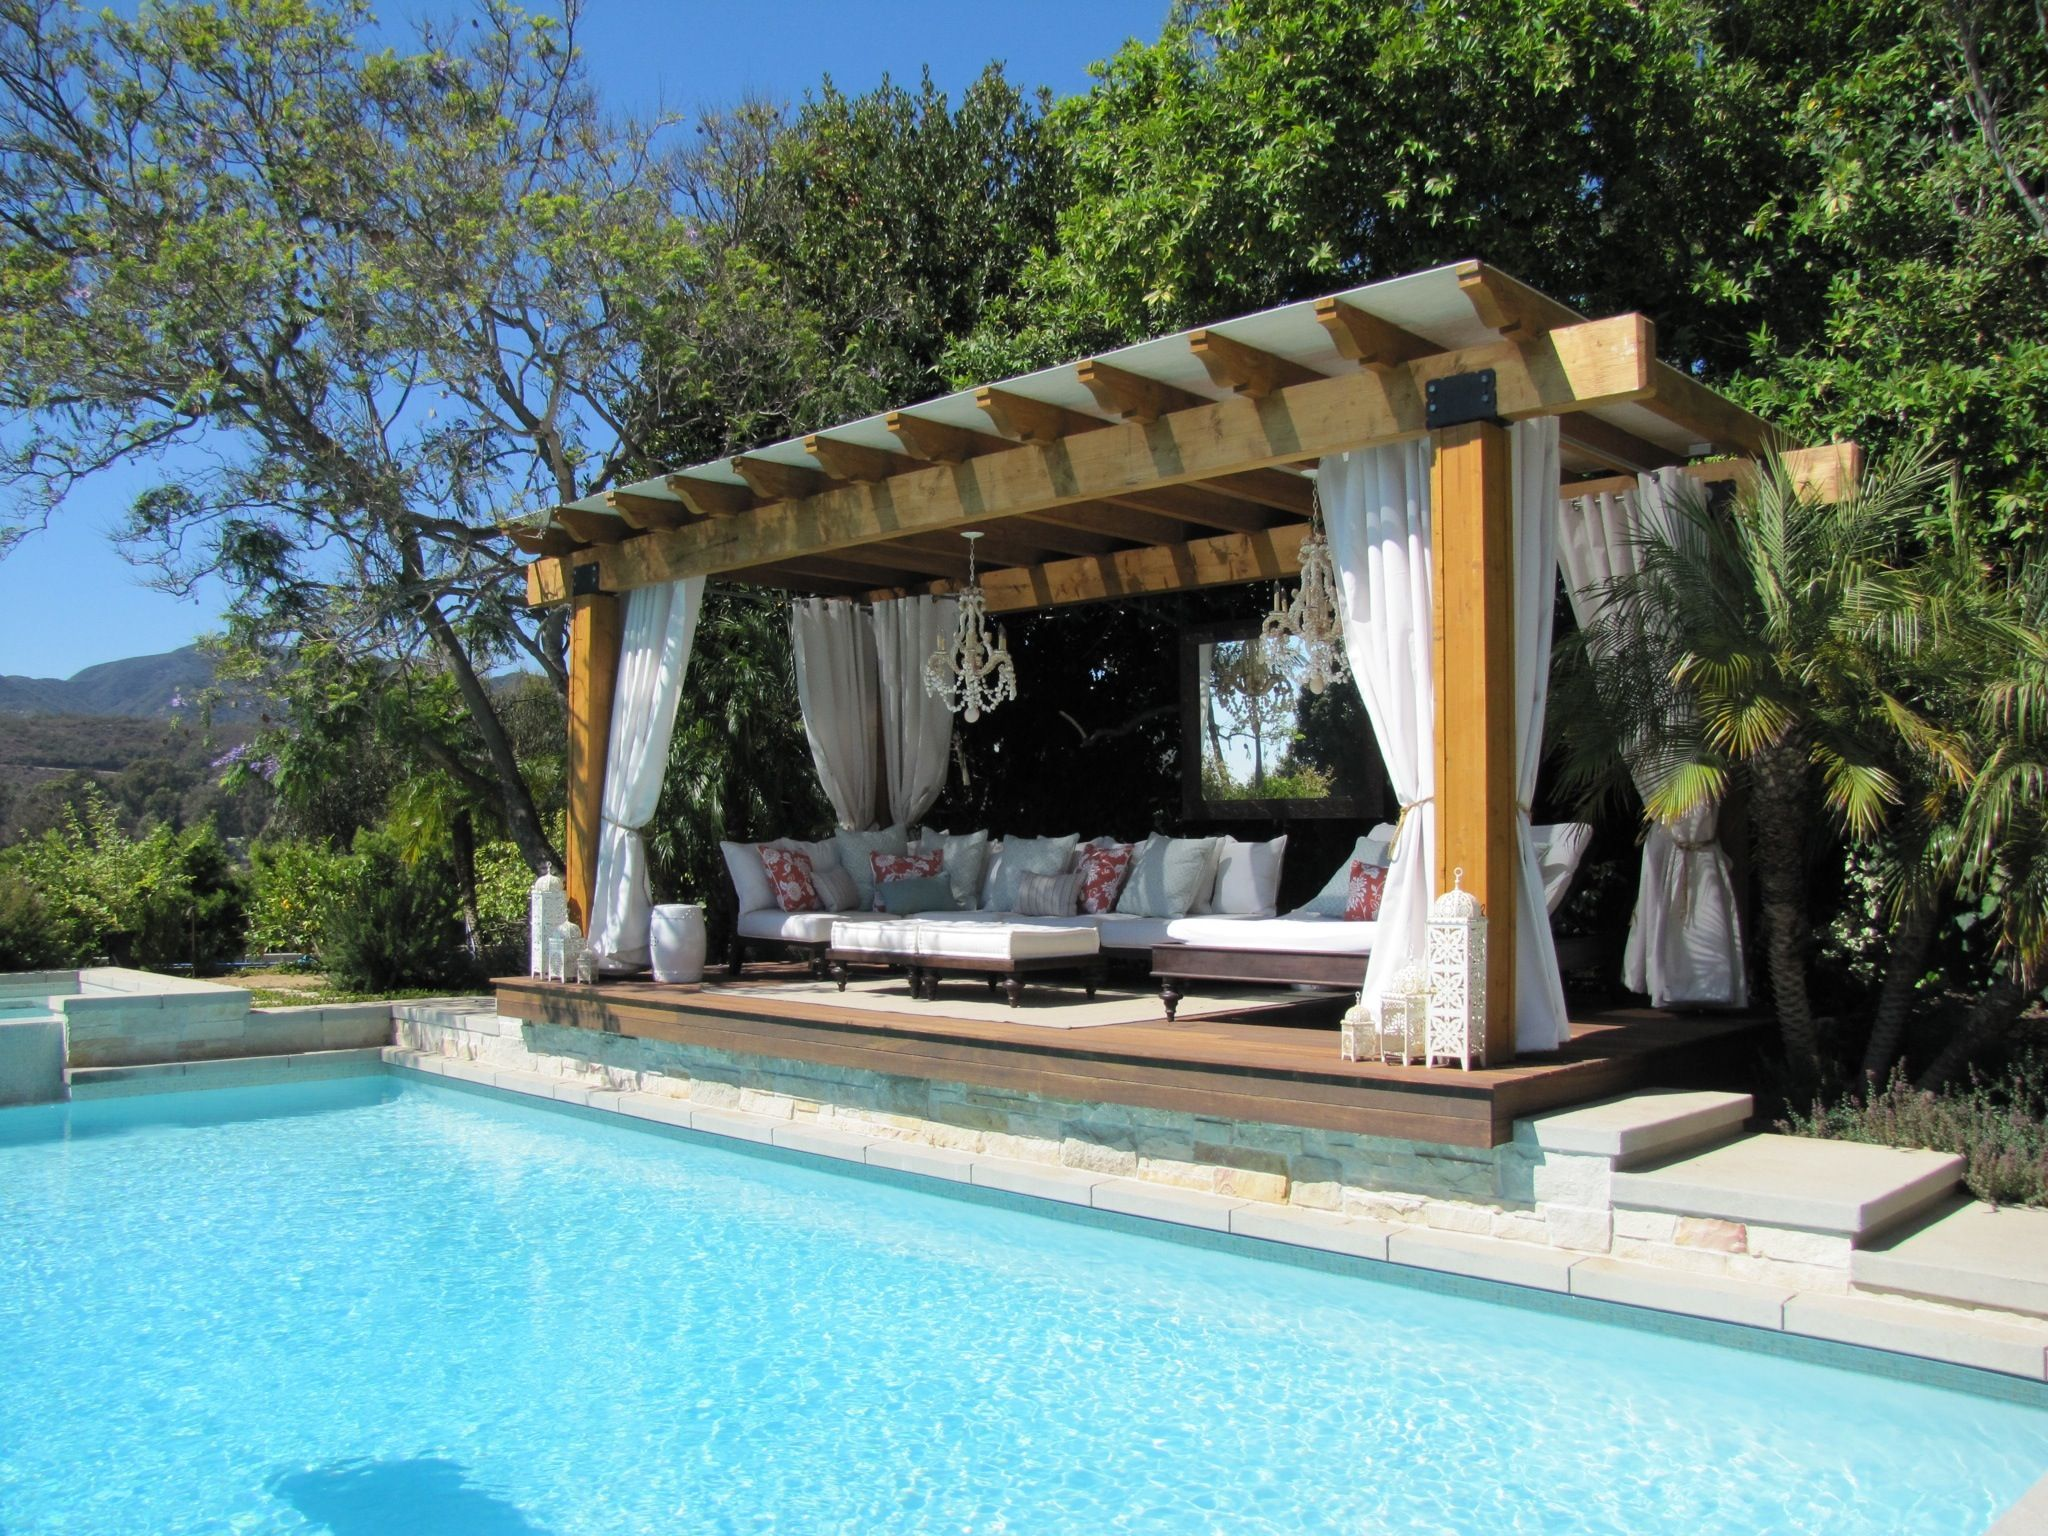 Outdoor Cabanas Designs Photo Gallery - Billion Estates on Patio Cabana Ideas id=91097